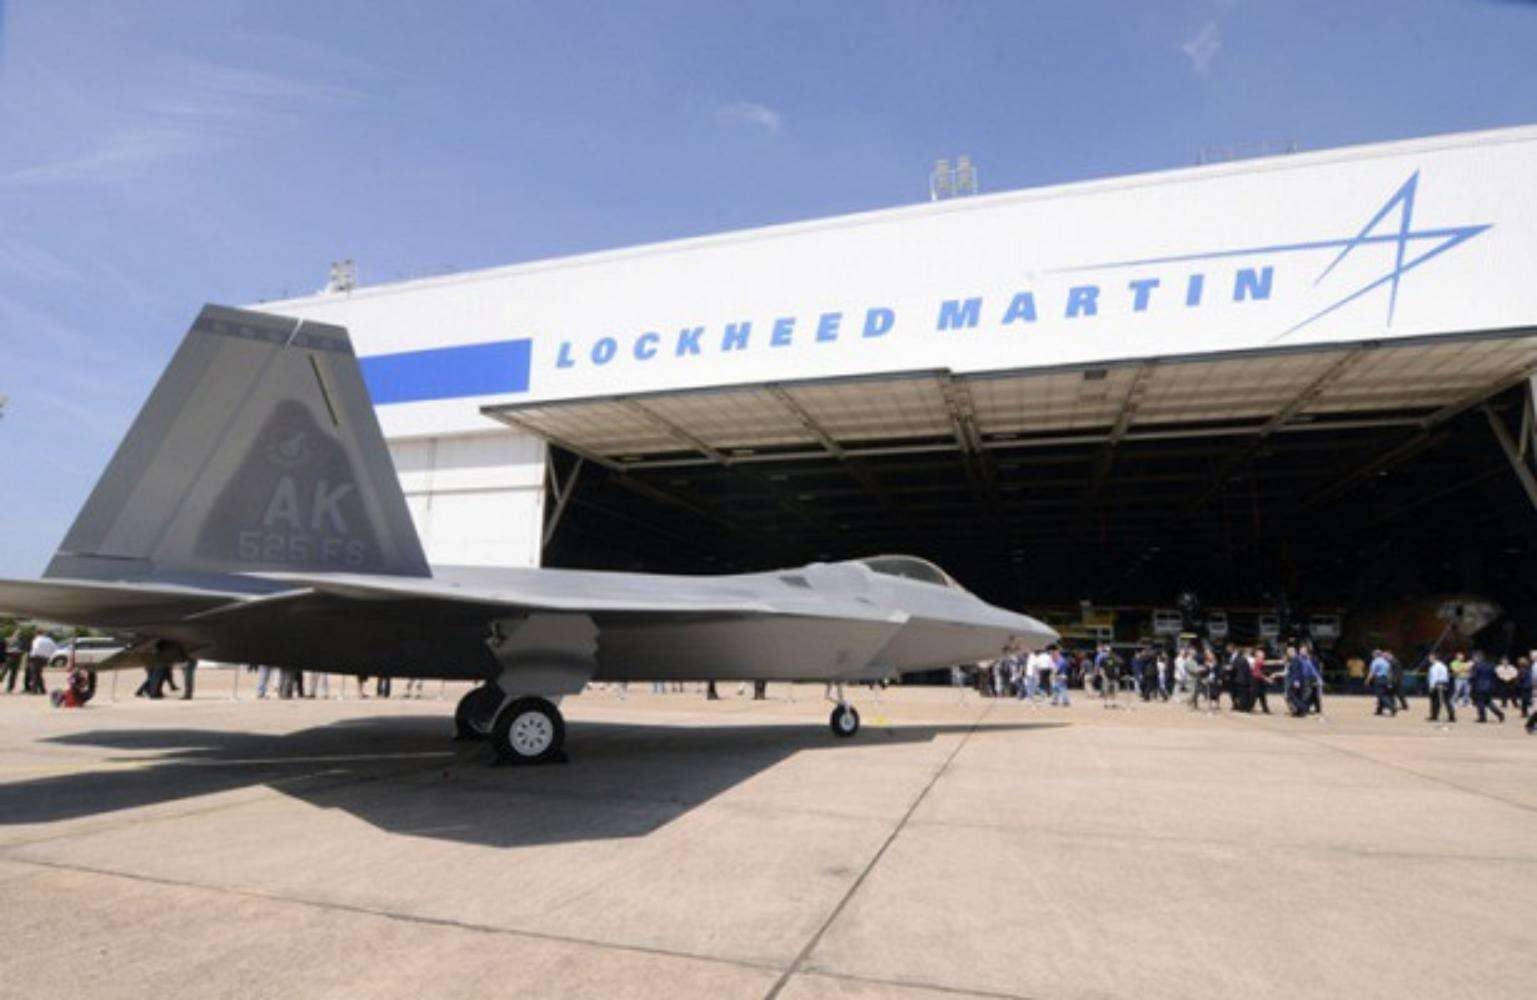 История развития Procter & Gamble и Lockheed Martin